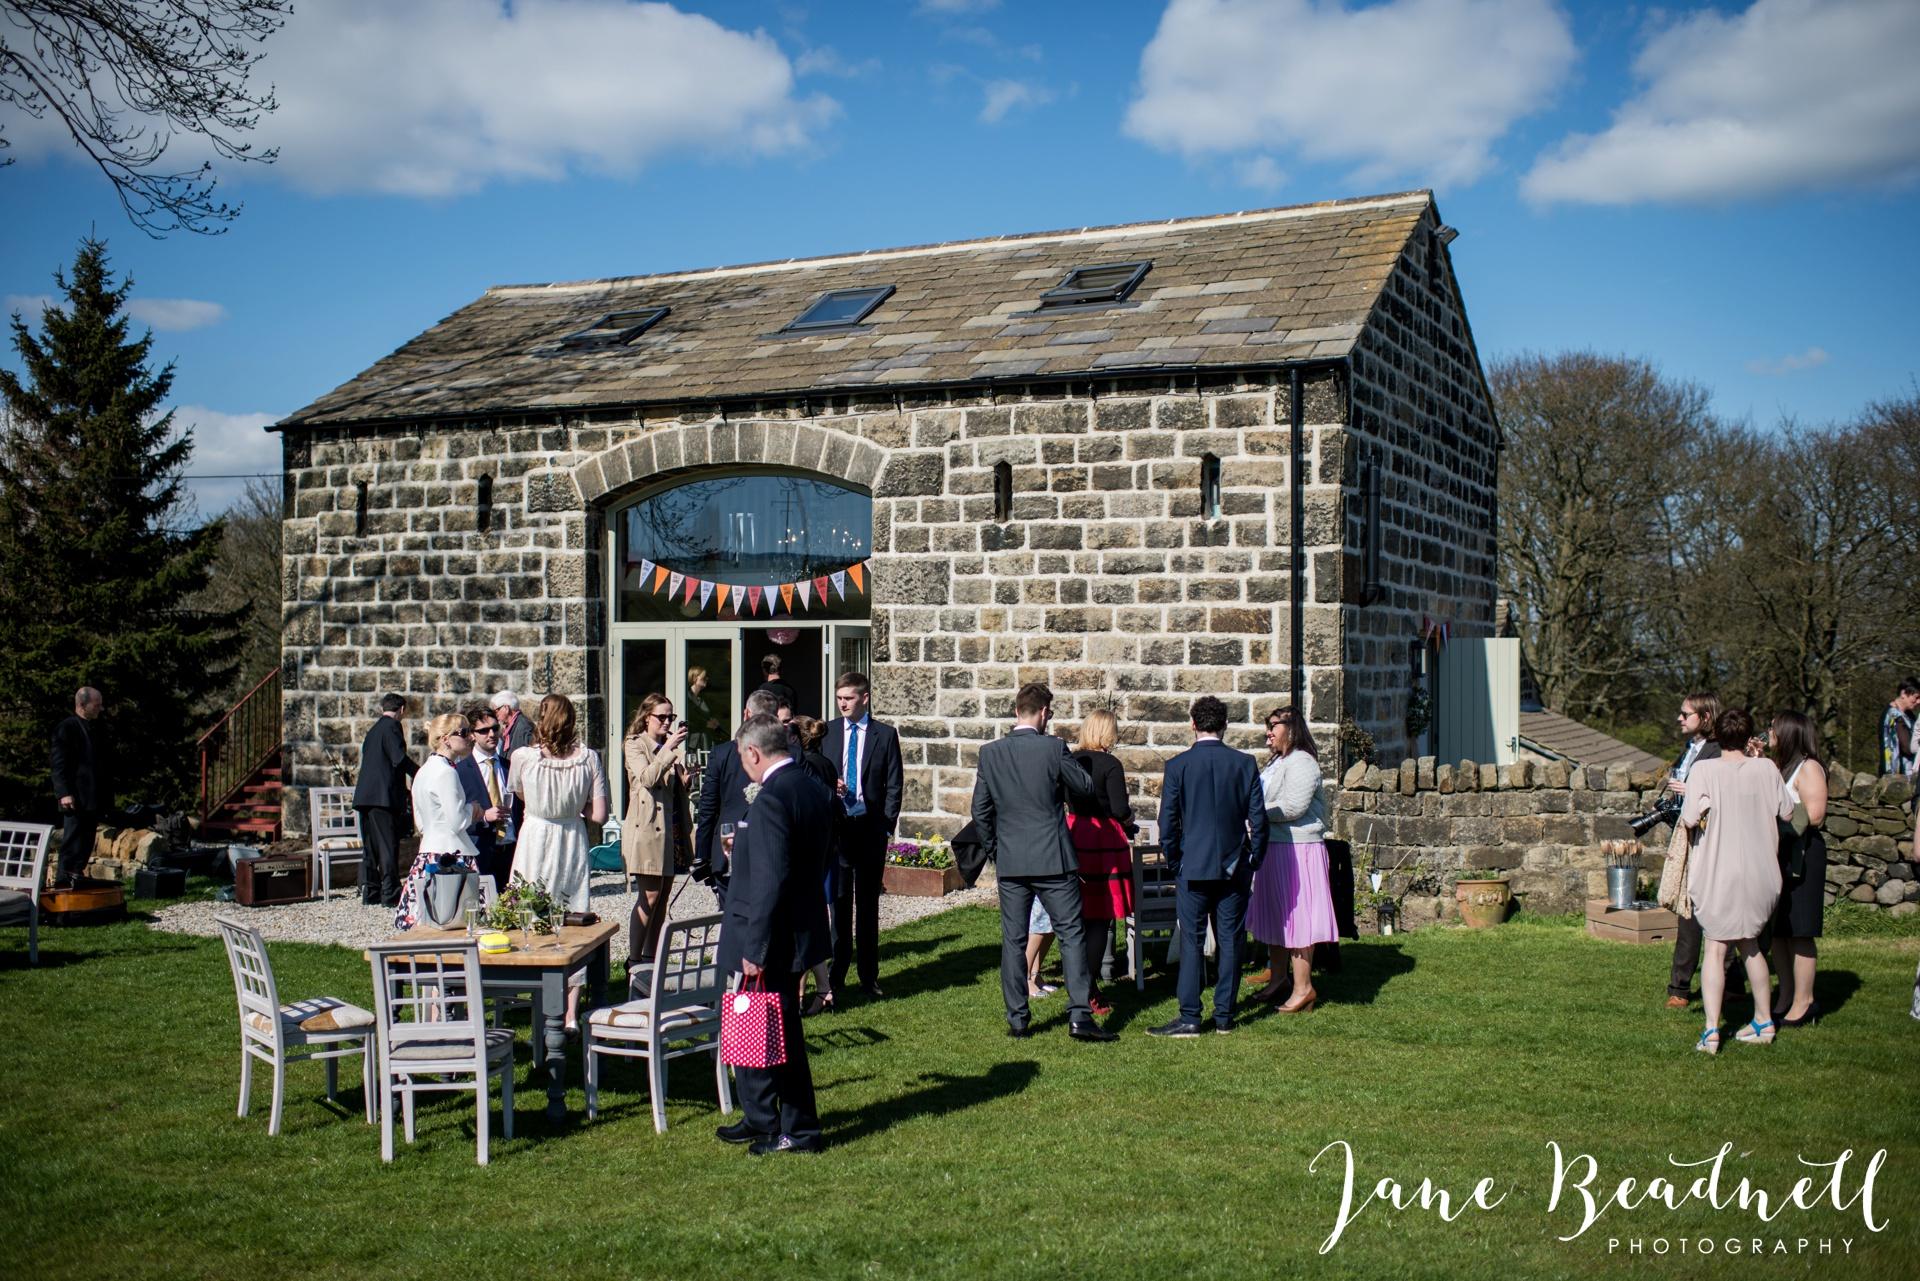 Jane Beadnell fine art wedding photographer The Cheerful Chilli Barn Otley_0029